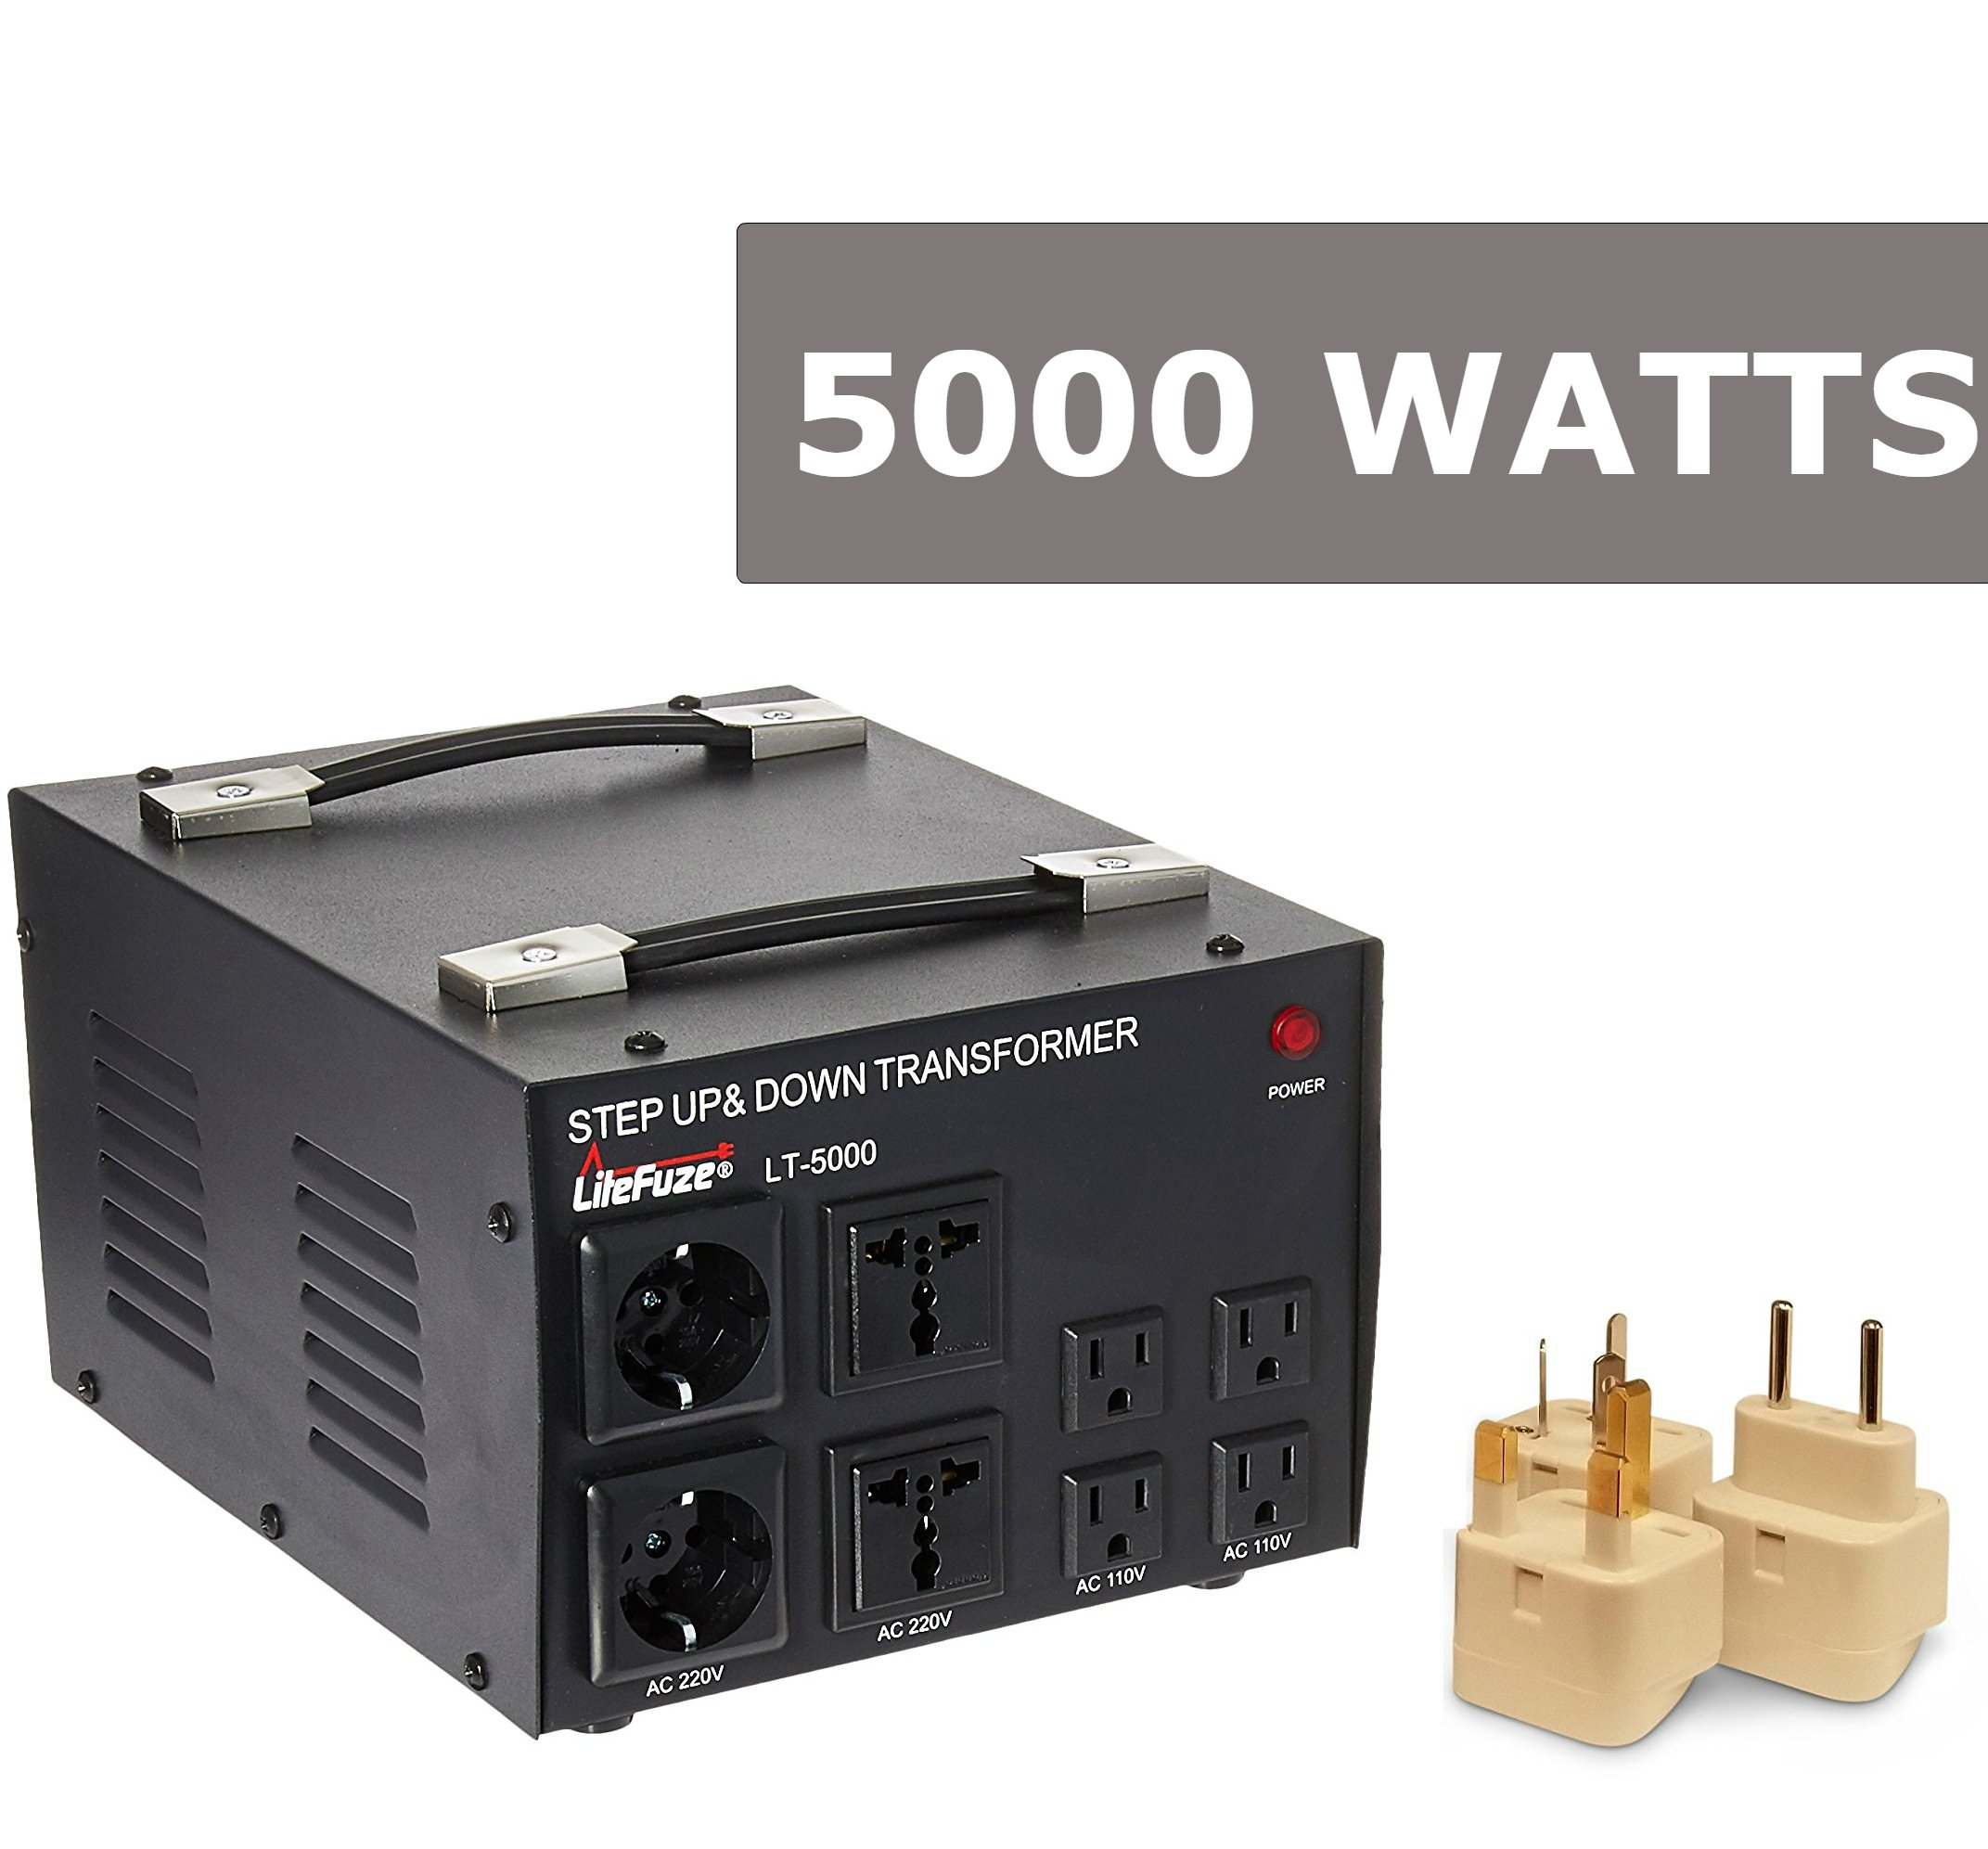 LiteFuze Best 5000 Watts Voltage Converter Transformer Step Up/Down 110V/220V Circuit Breaker Protection Power Converter - with Worldwide UK/US/AU/EU Travel Plug Adapter